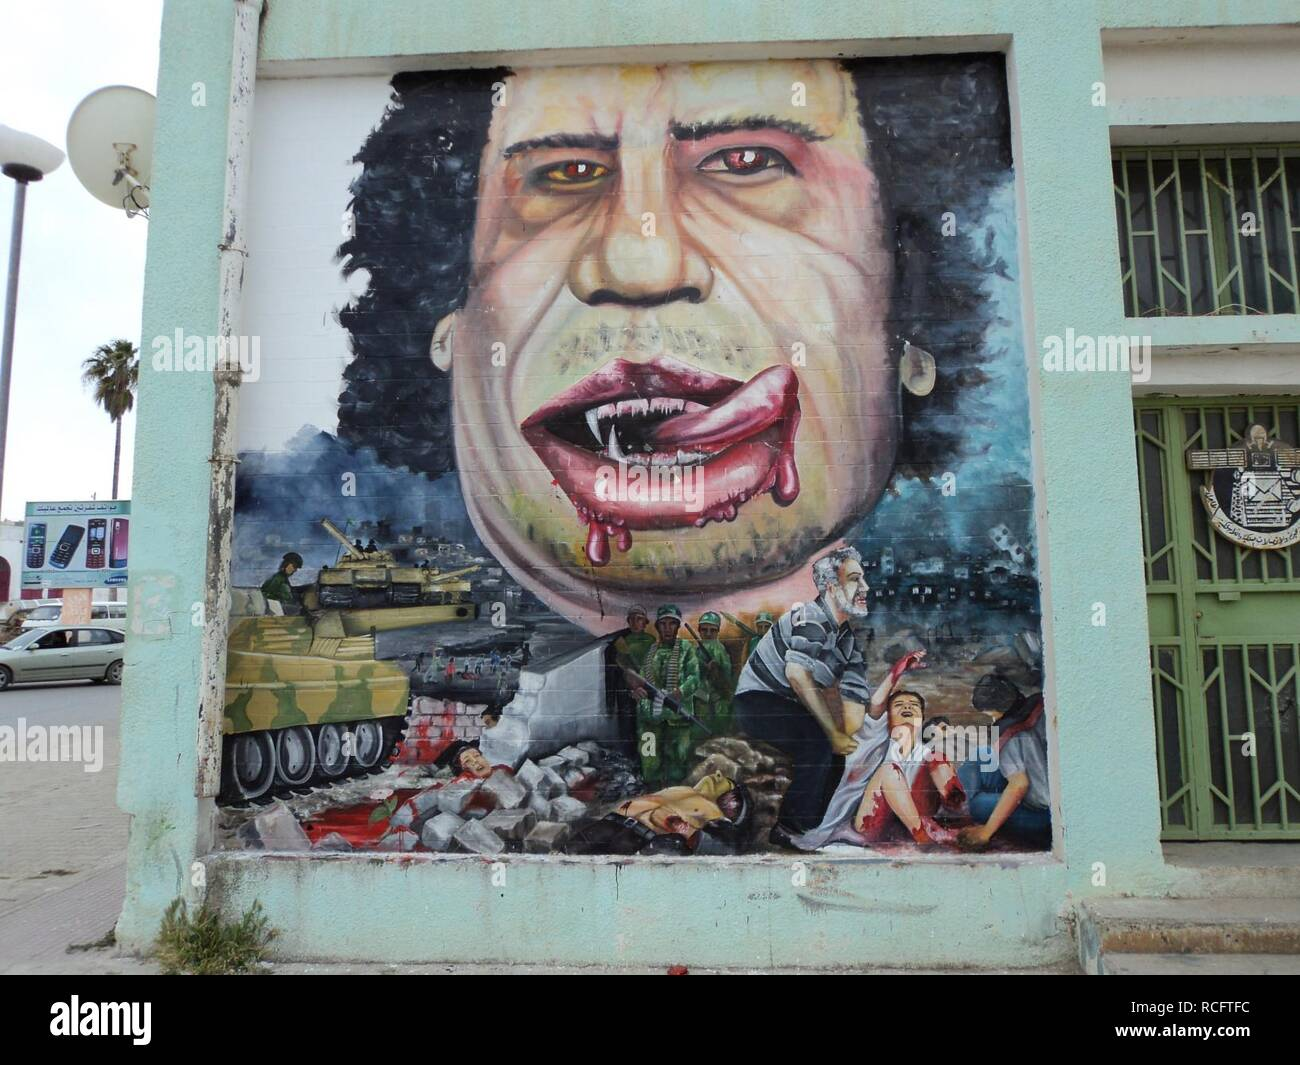 Al Bayda caricatures of Gadafi. - Stock Image